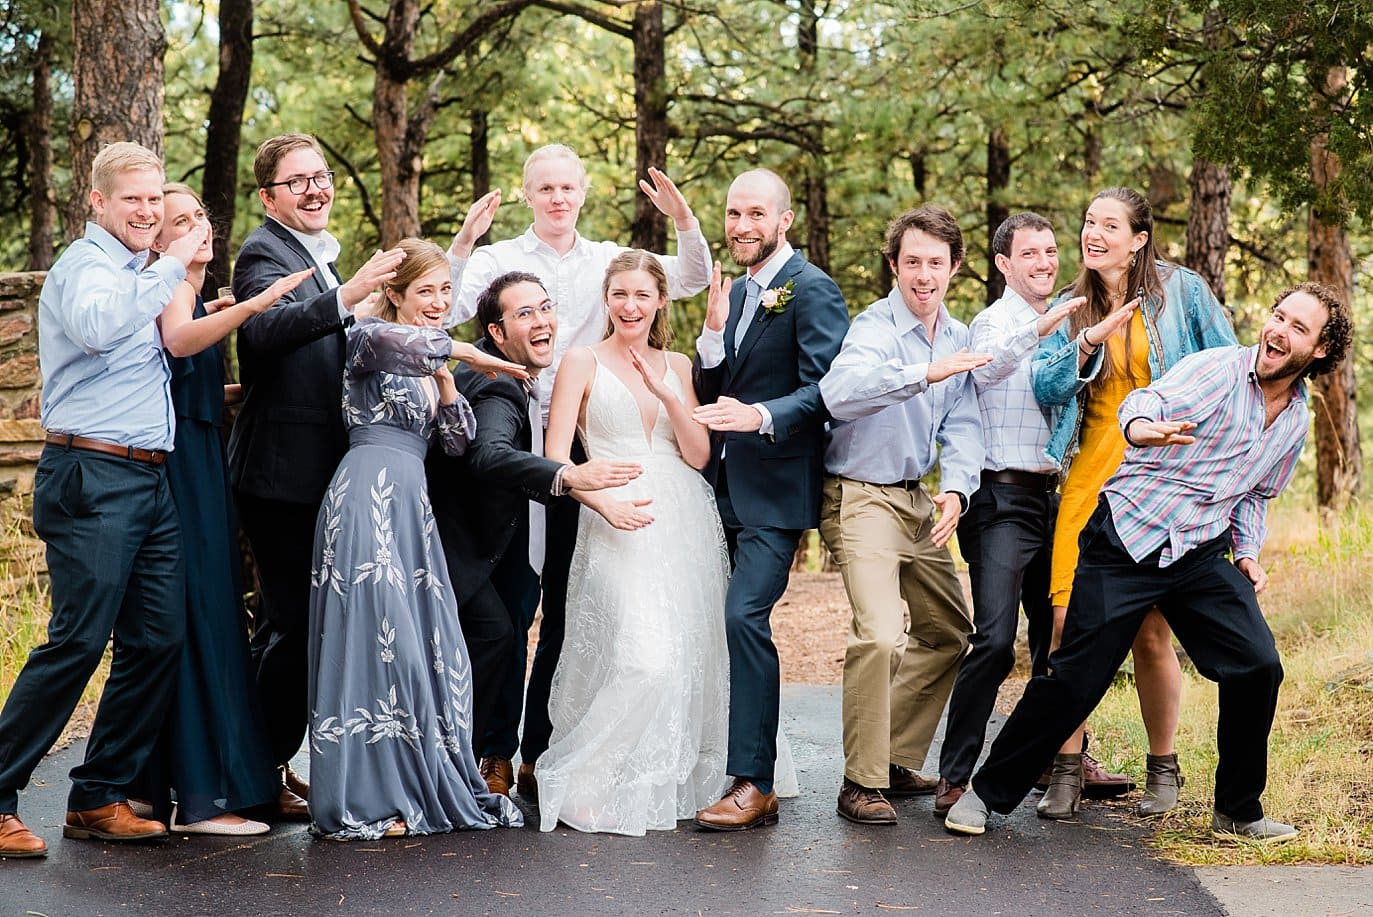 best friends group photo outdoor wedding